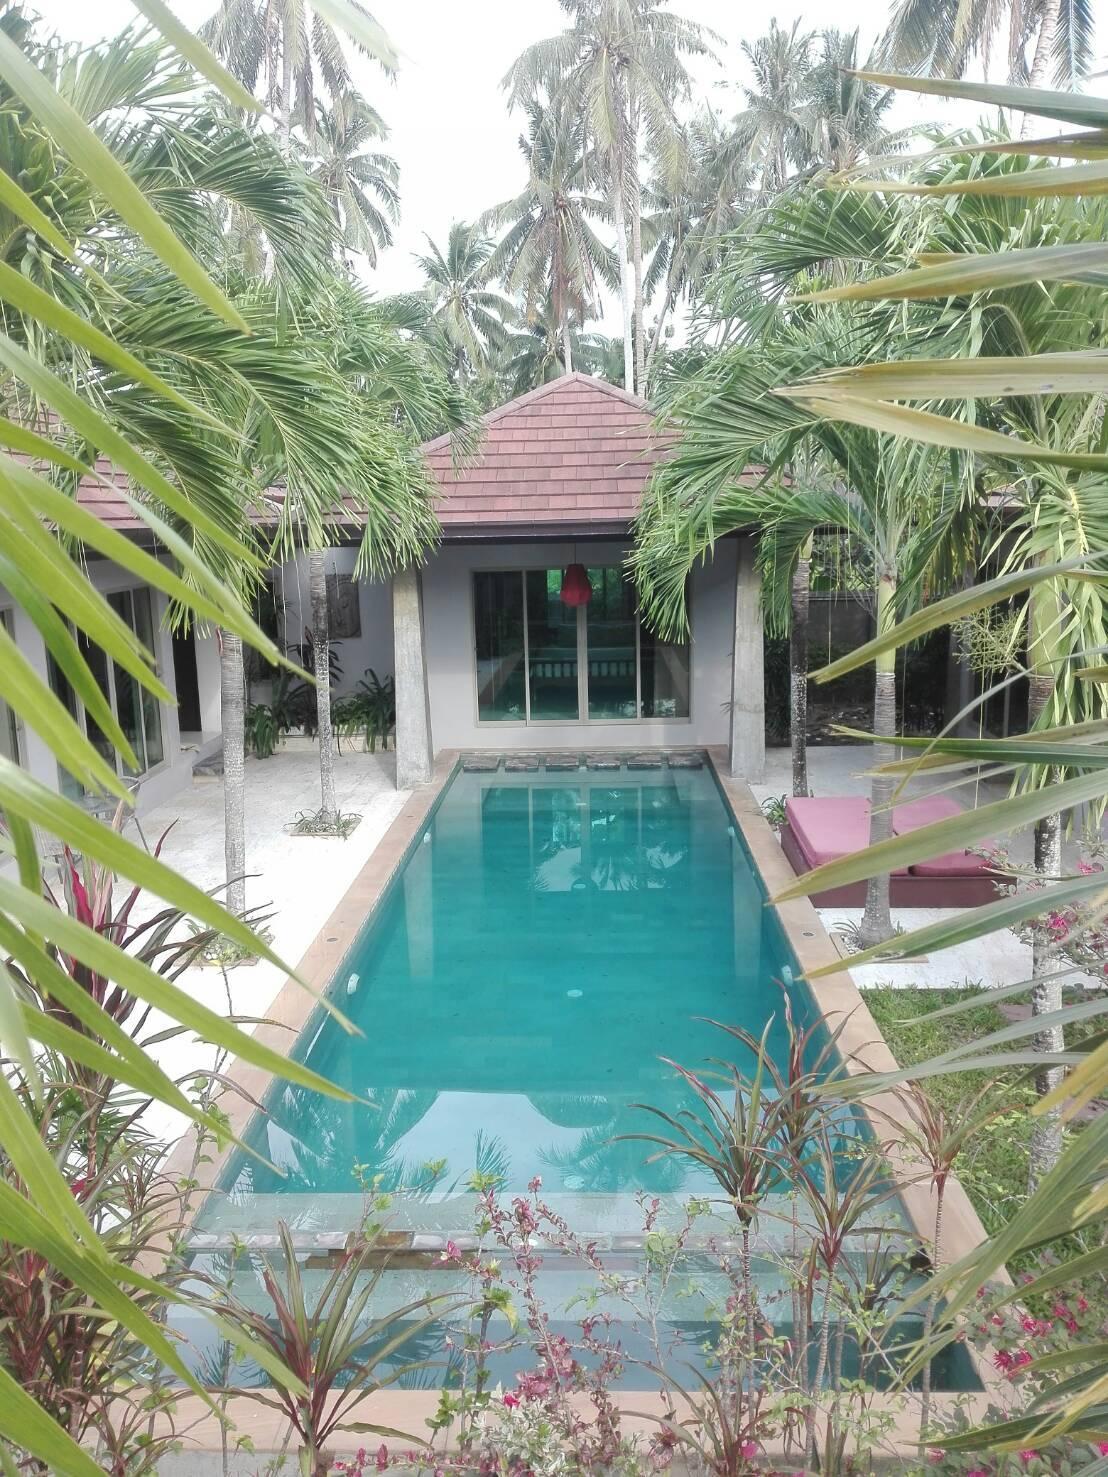 Bali Style Private Villa 1 By Natasak